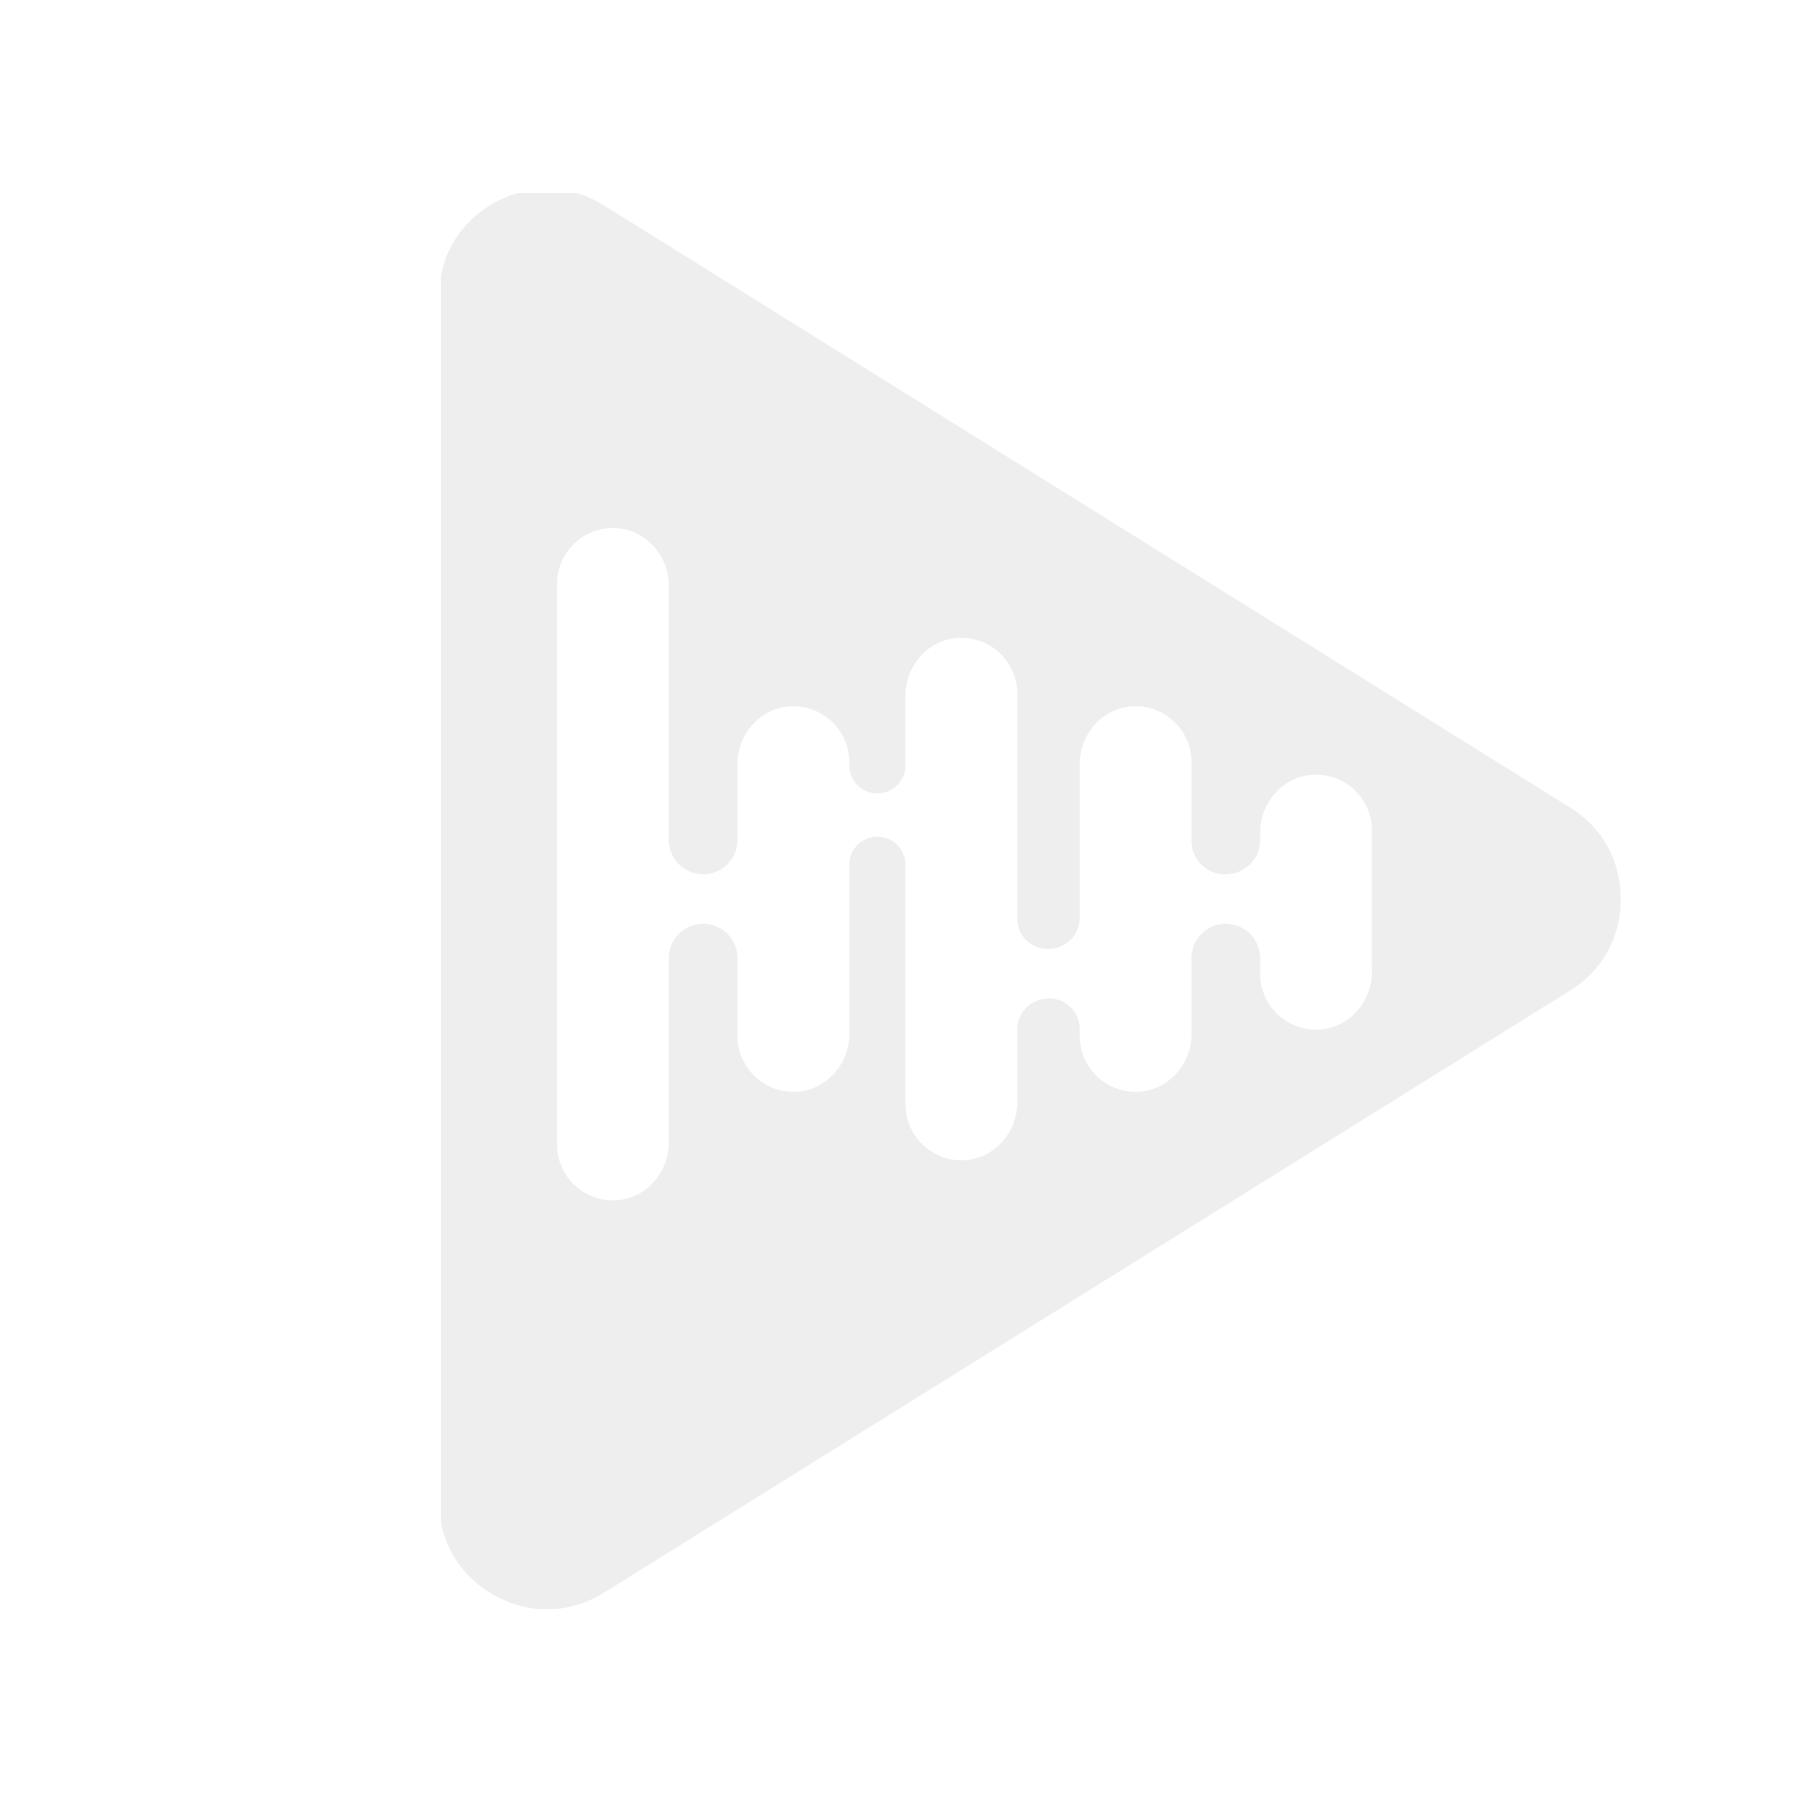 AZ Audiocomp VELCRO-TAPE